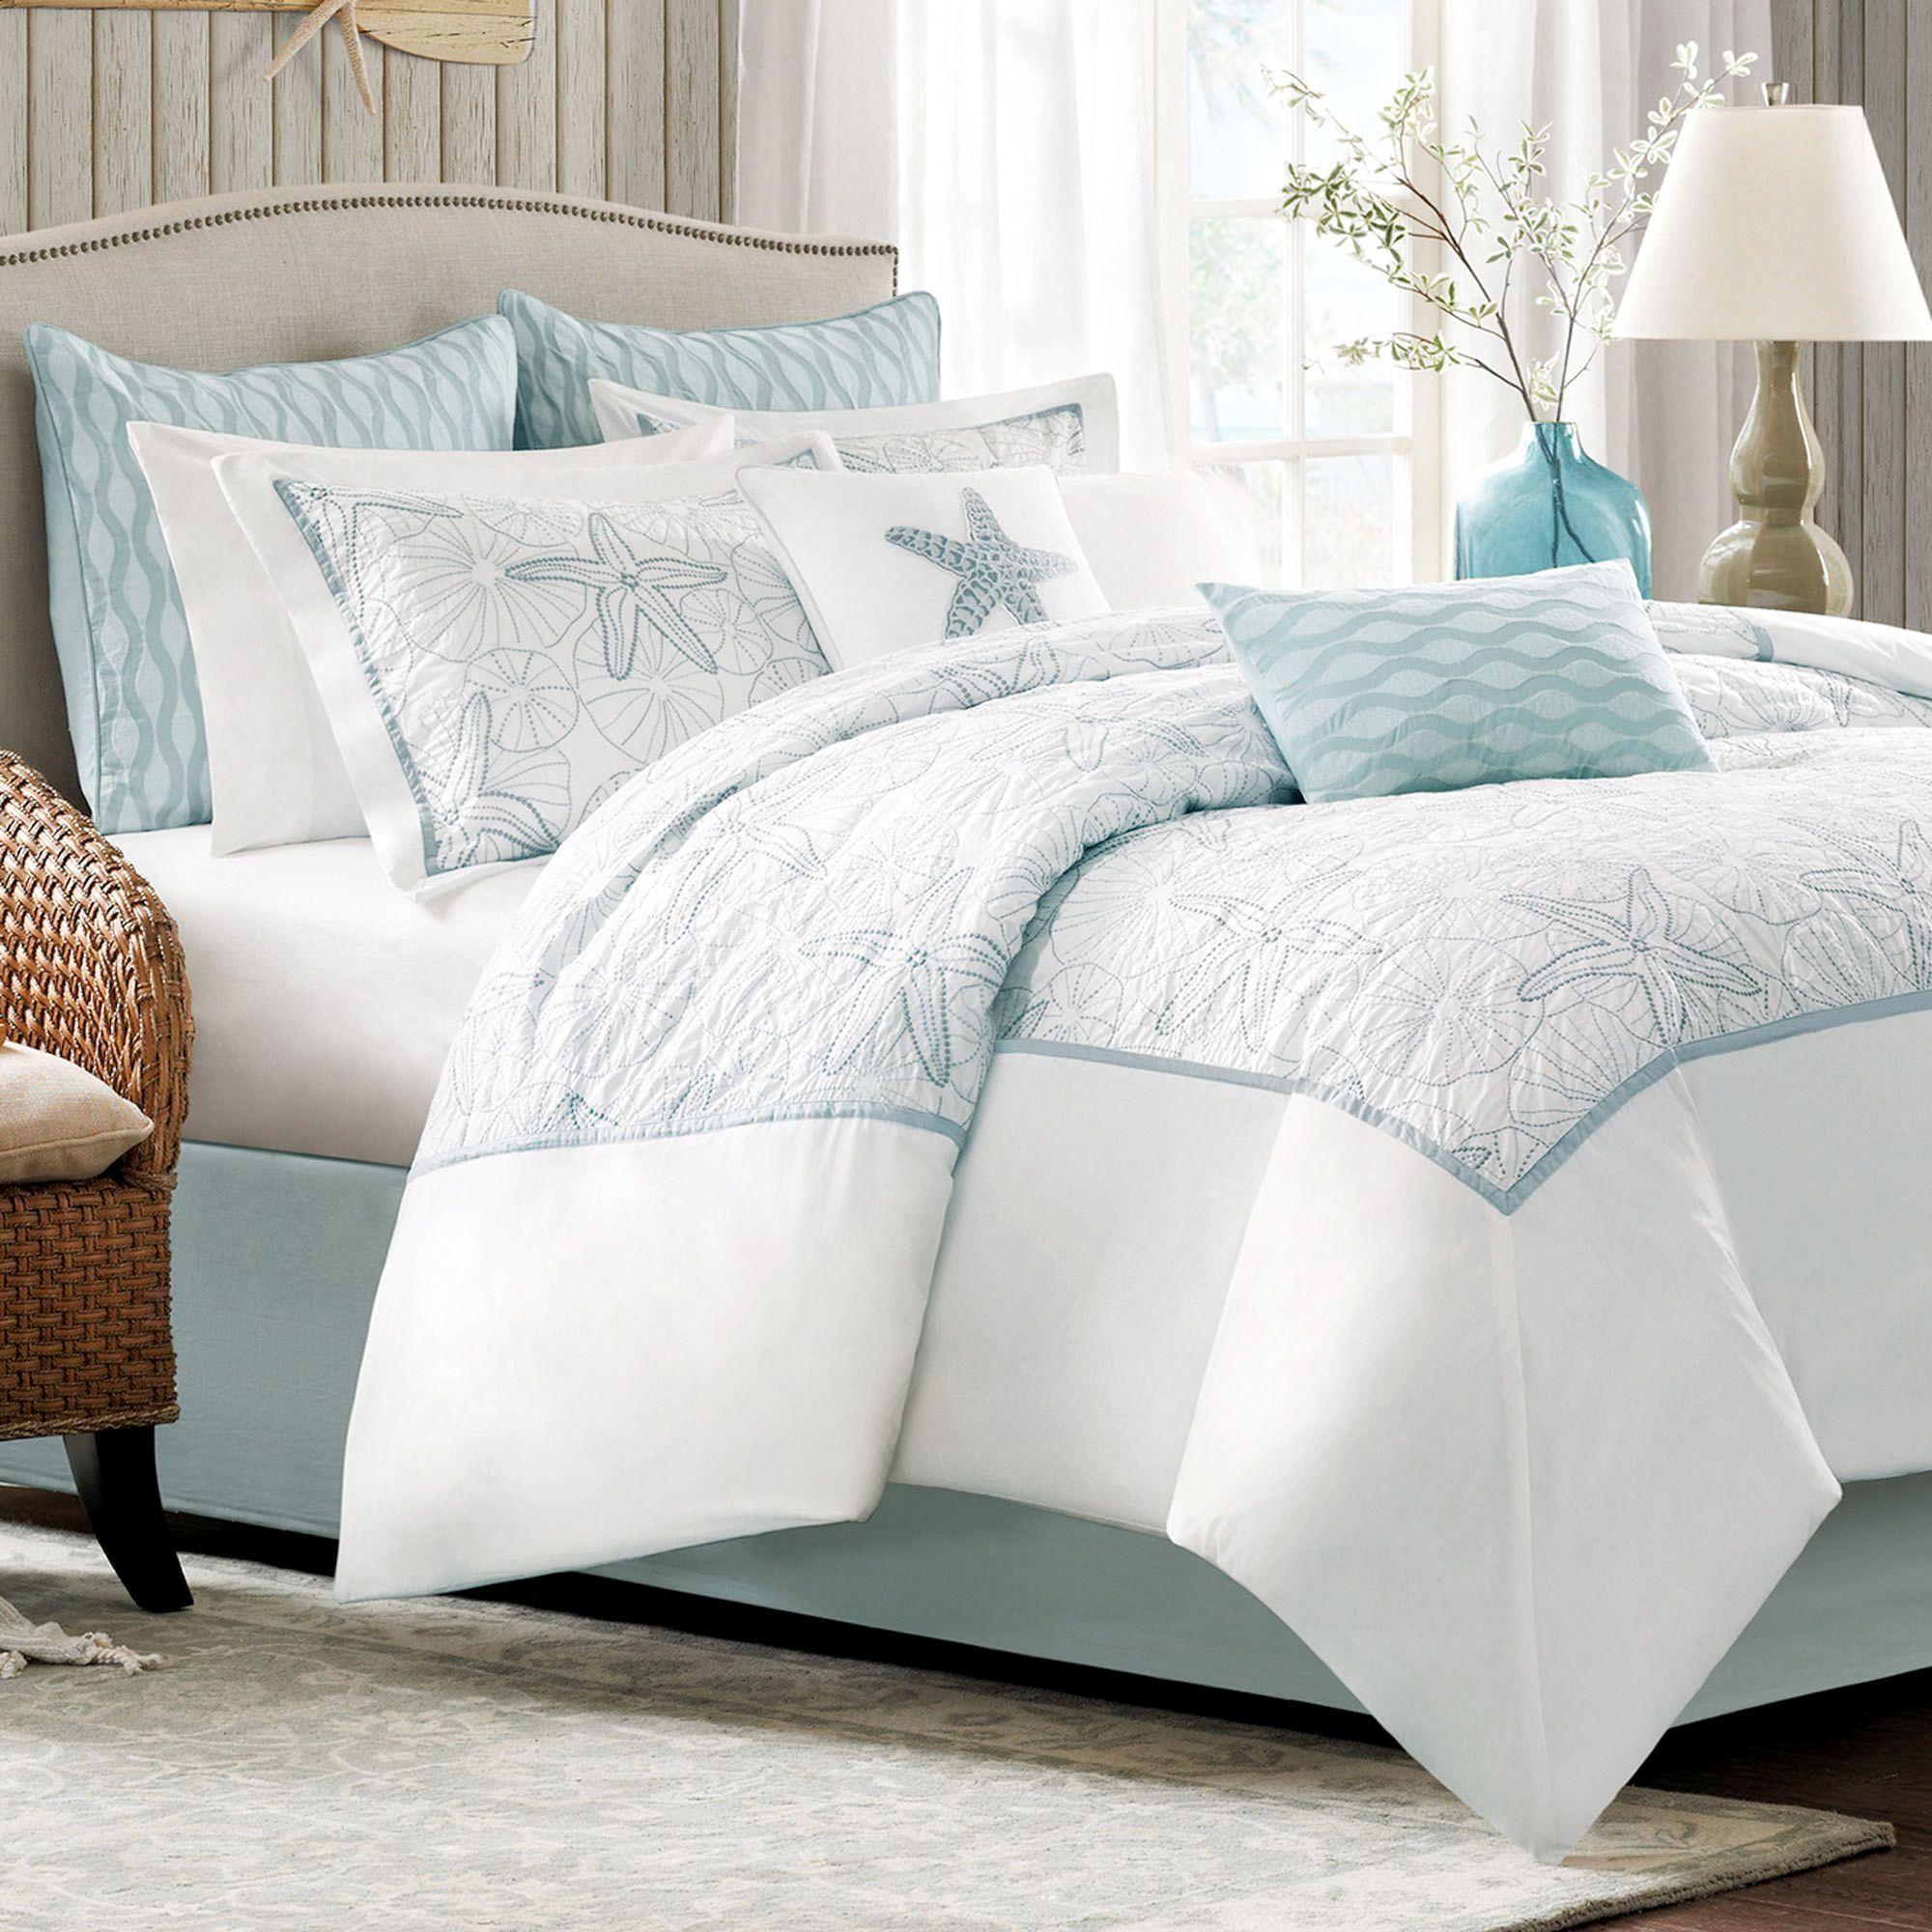 Maya Bay Embroidered Coastal Comforter Bedding